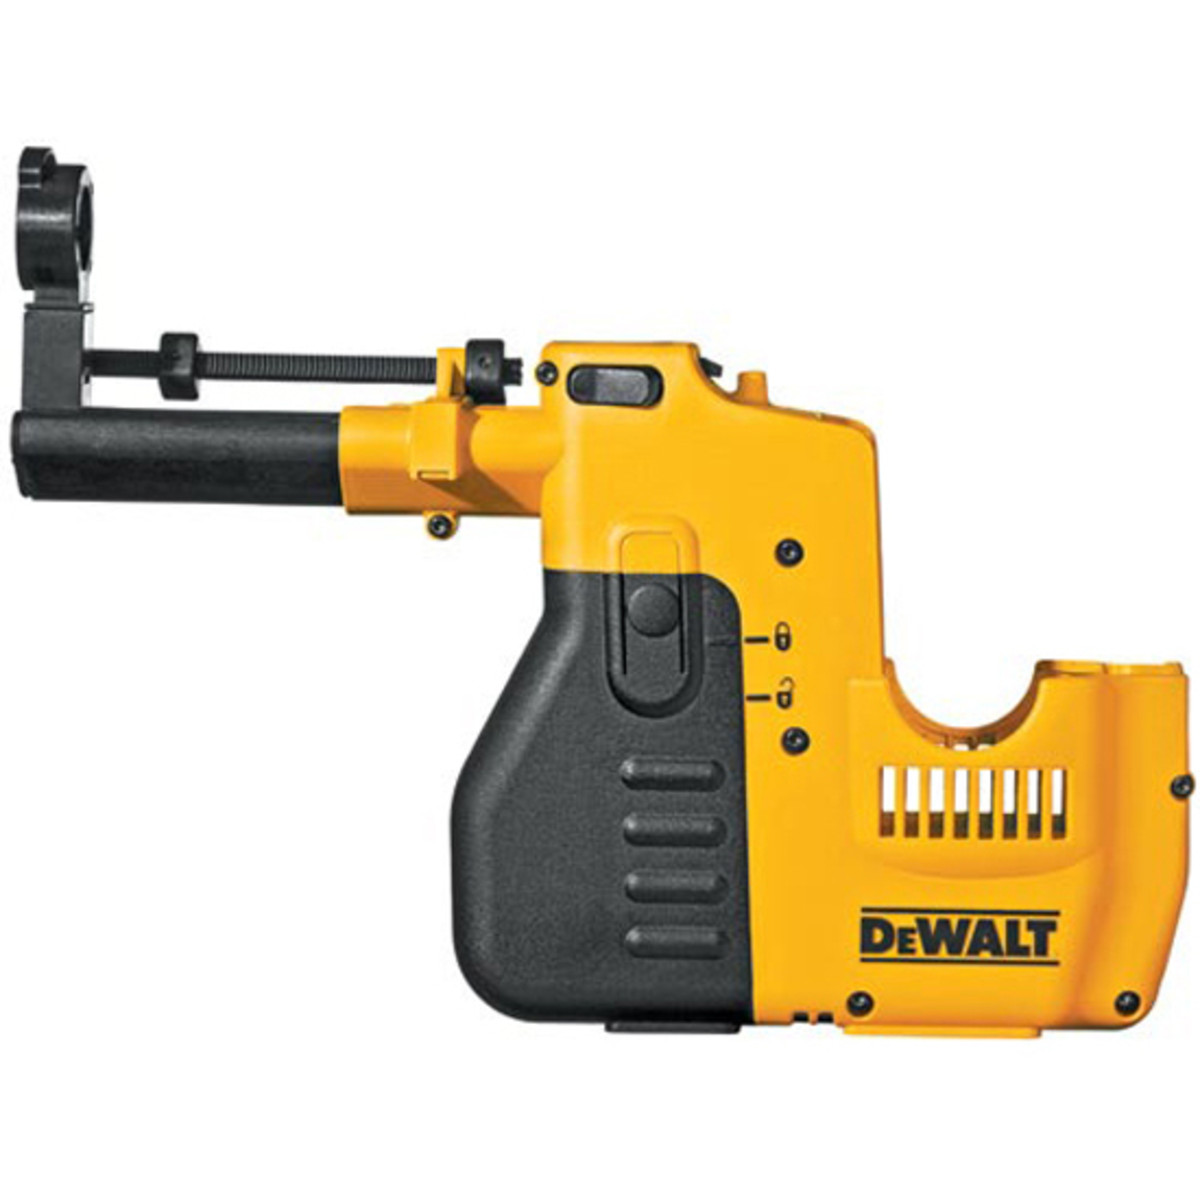 D25300D Dewalt Heavy-Duty Rotary Hammer